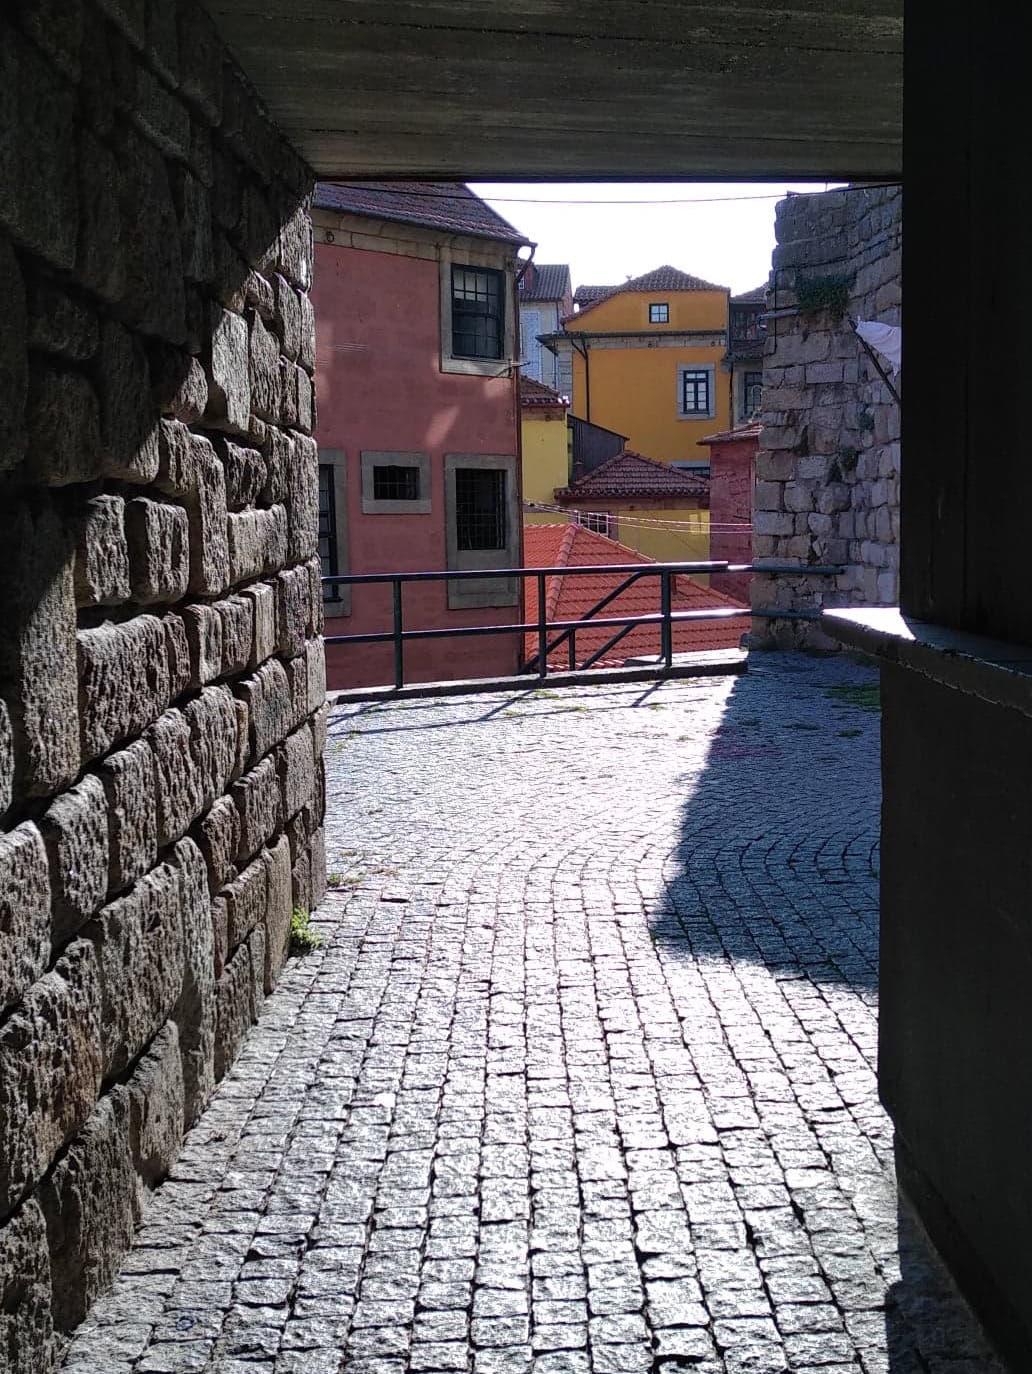 Les rues colorées de Porto